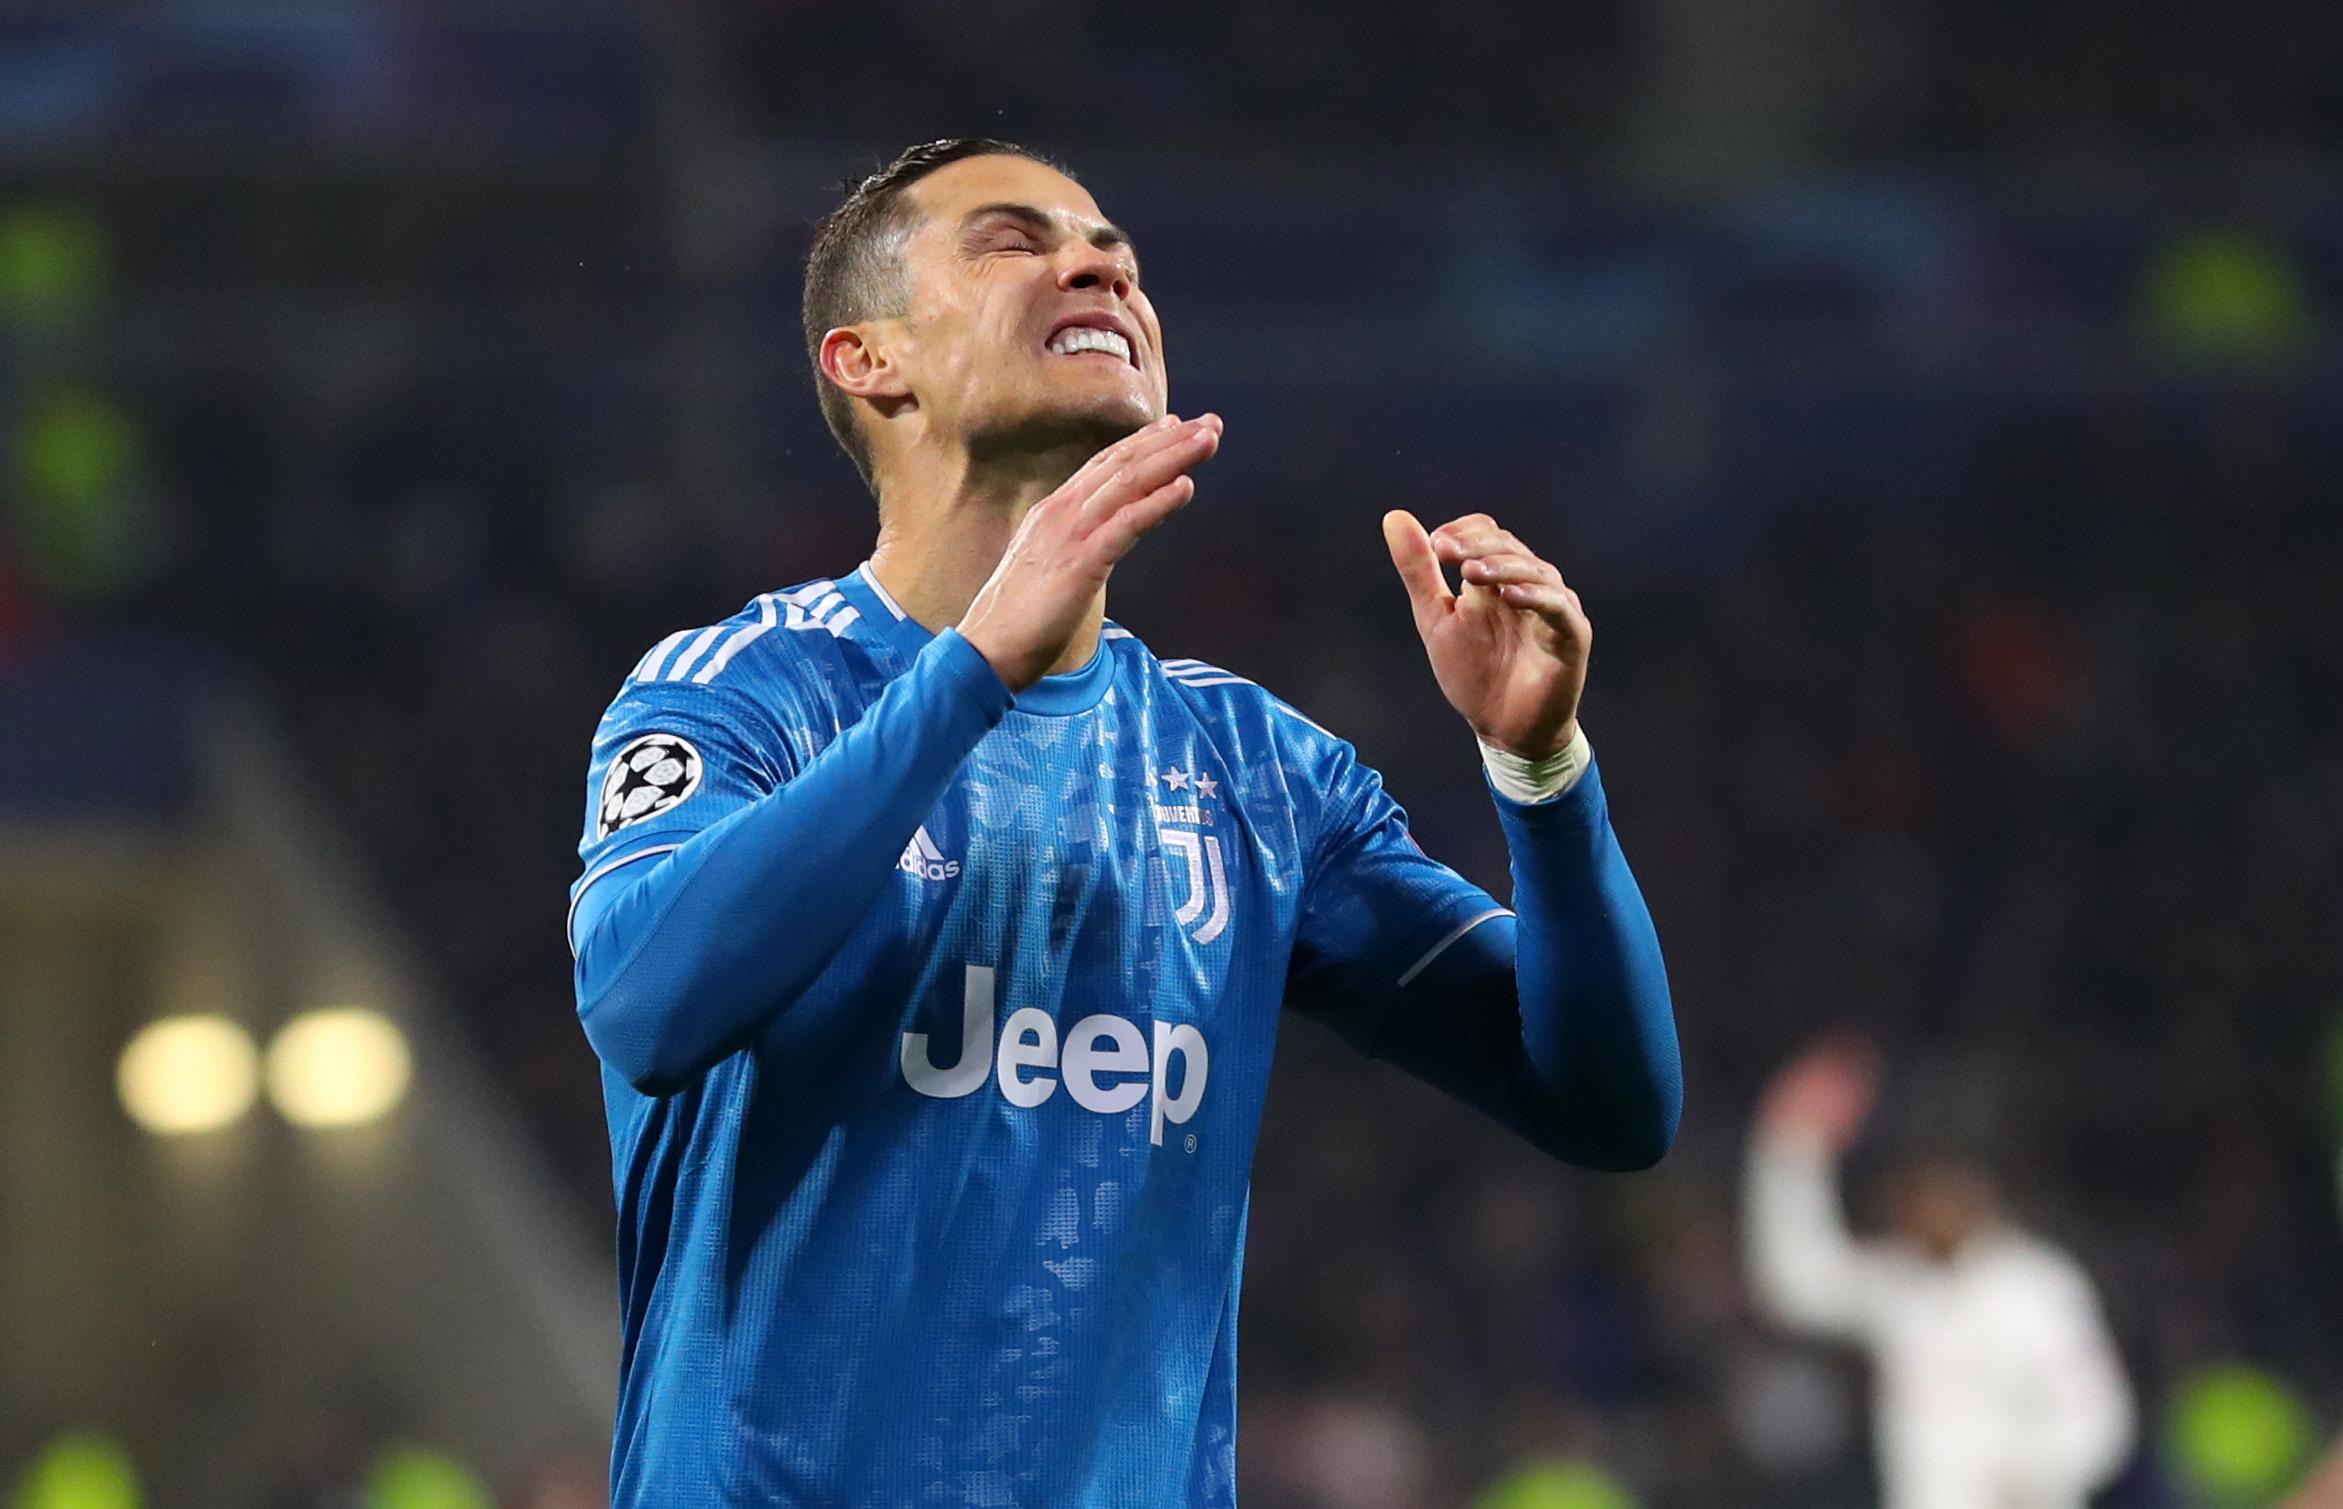 Lyon stuns Juventus and Cristiano Ronaldo